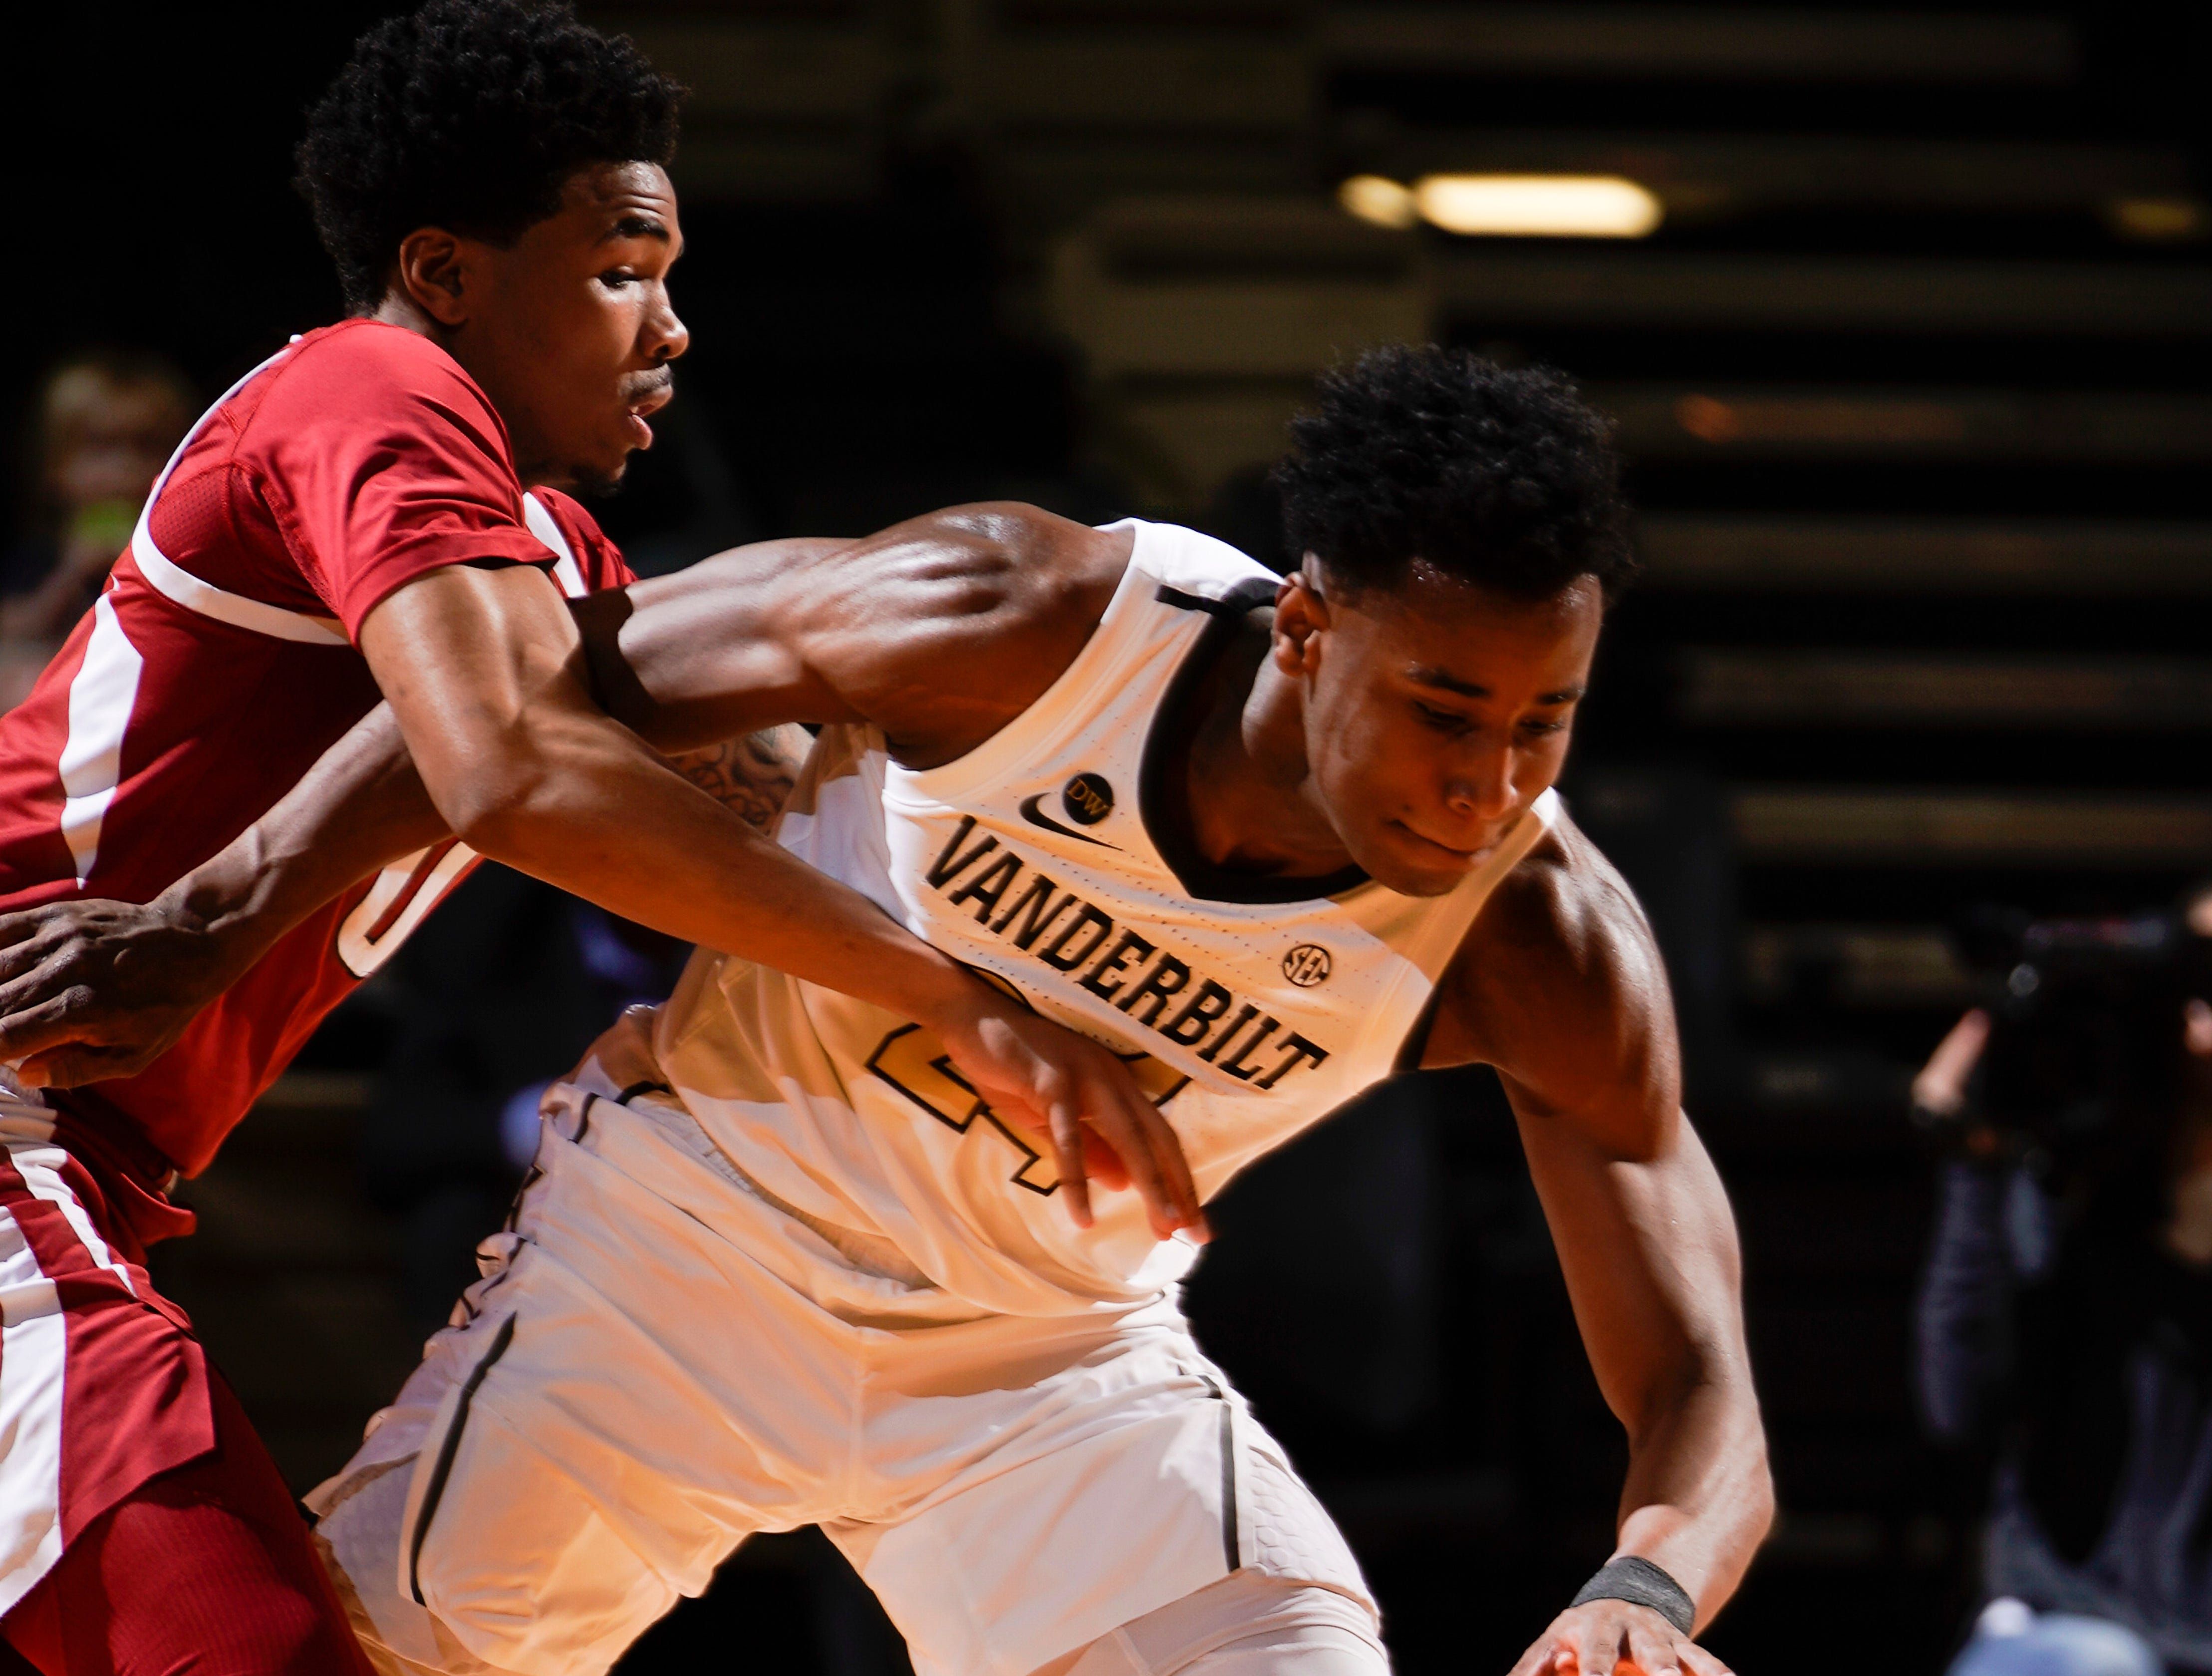 Vanderbilt forward Aaron Nesmith (24) steals the ball away from Arkansas guard Desi Sills (0) during the first half at Memorial Gym Wednesday, March 6, 2019 in Nashville, Tenn.